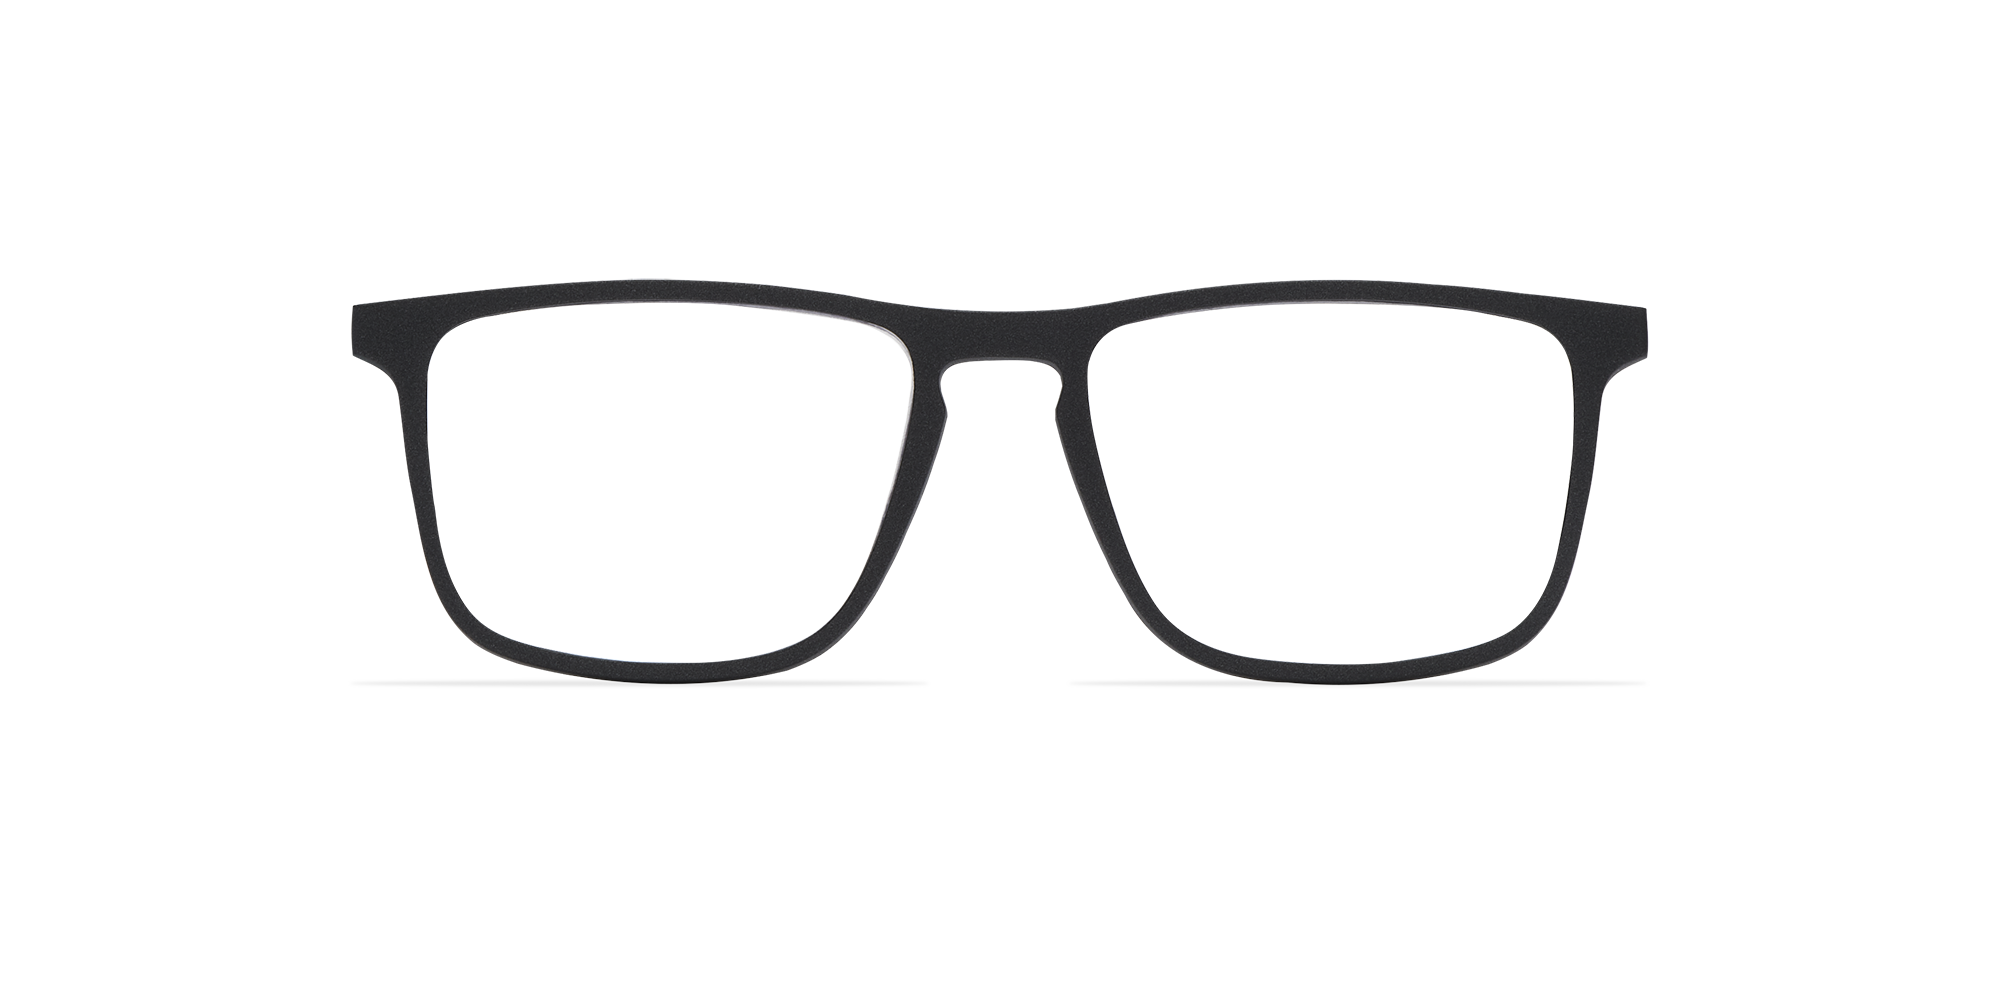 afflelou/france/products/smart_clip/clips_glasses/07630036428856_face.png